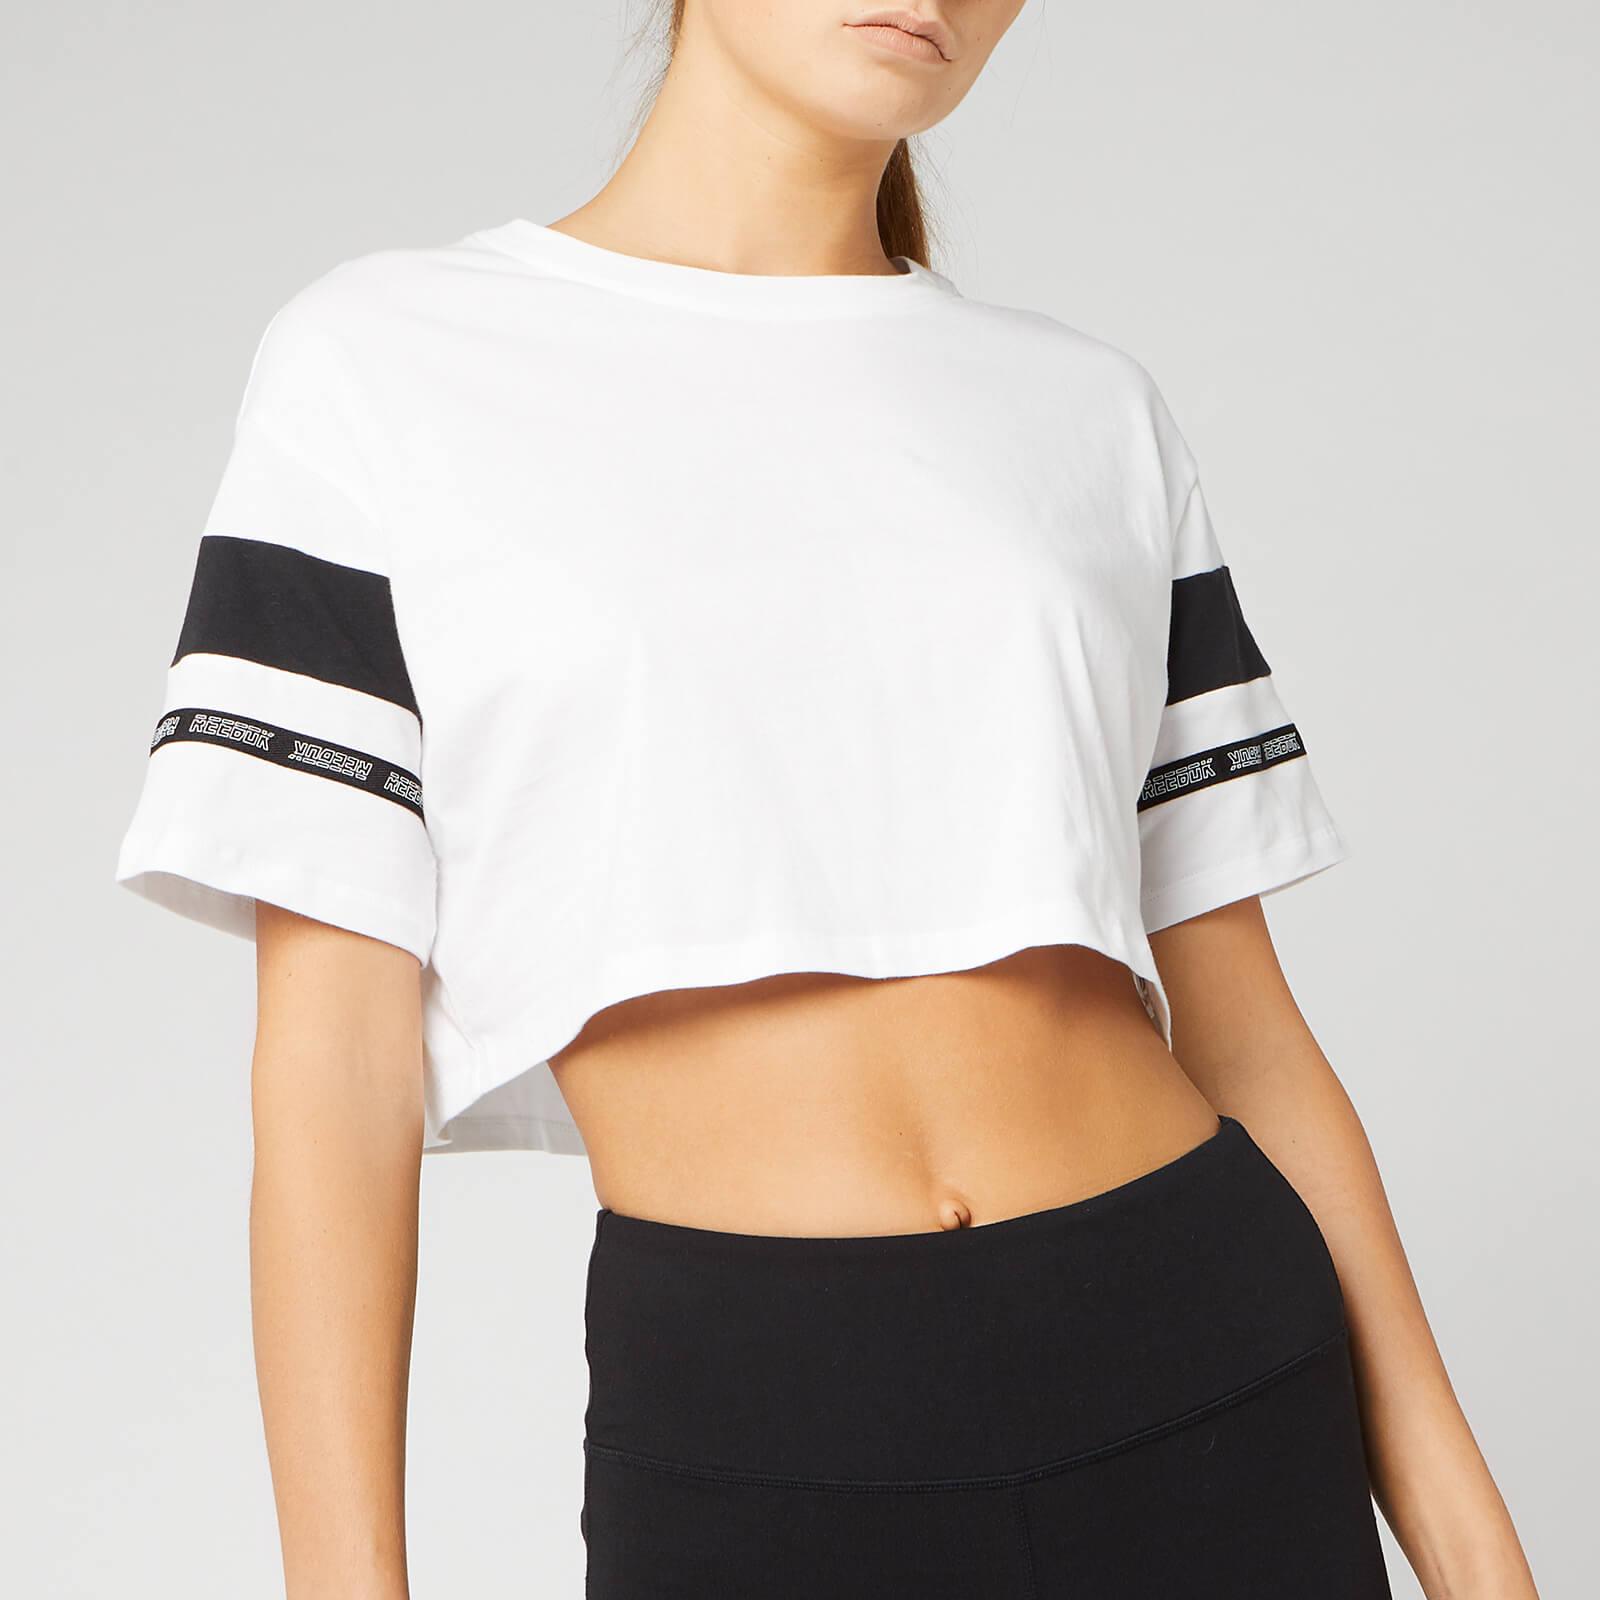 Reebok Women's WOR MYT Solid Cropped Short Sleeve T-Shirt - White - M - White